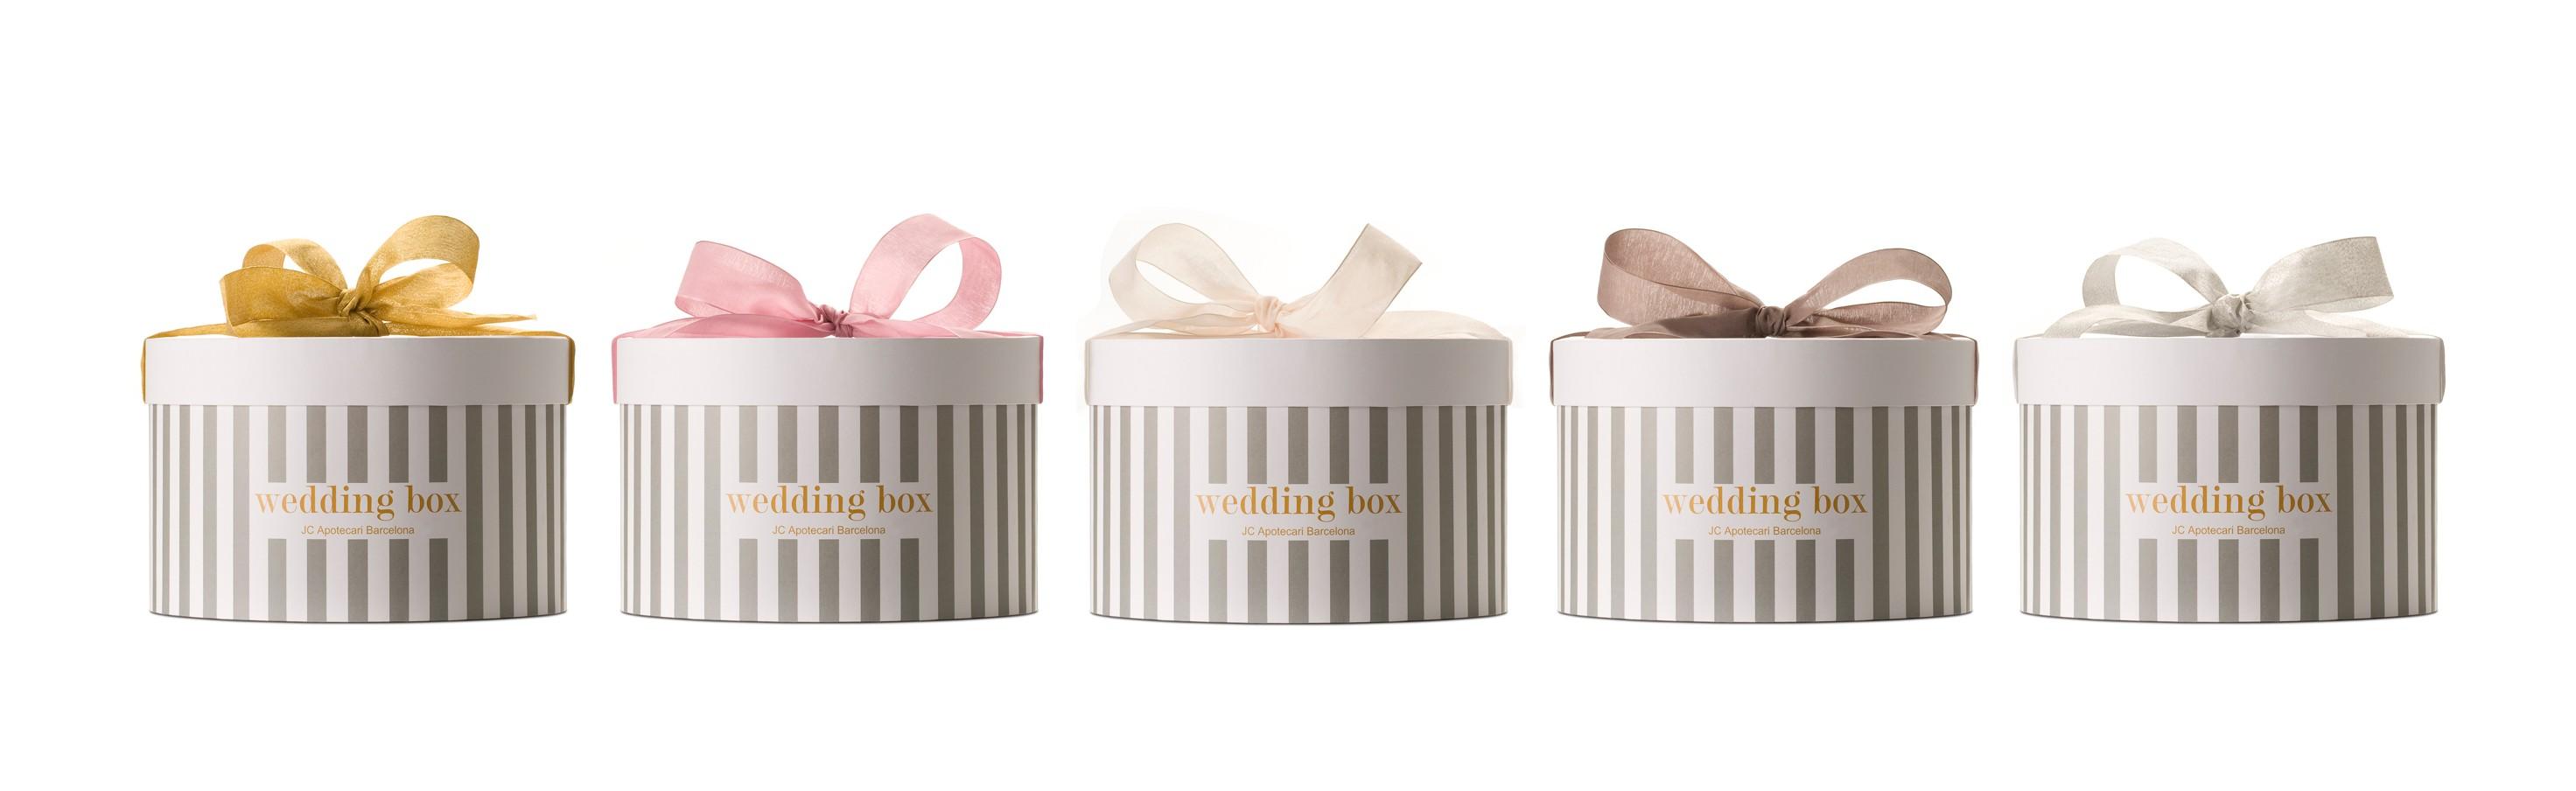 Wedding Box-JC Apotecari